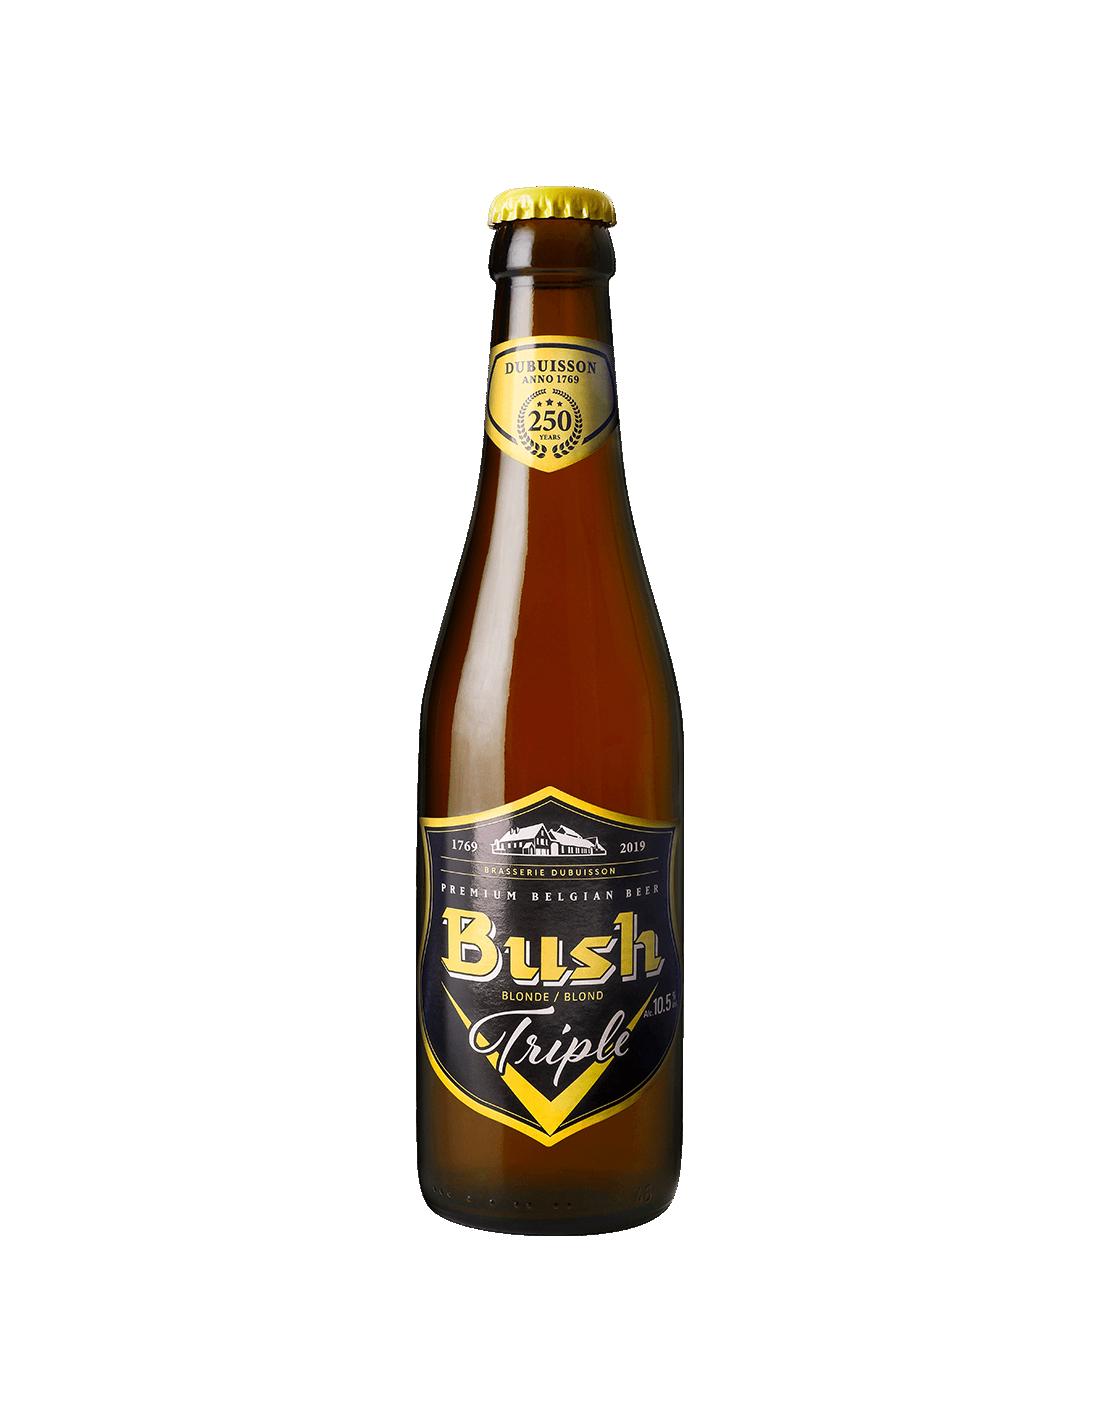 Bere blonda, filtrata Bush, 10.5% alc., 0.33L, Belgia